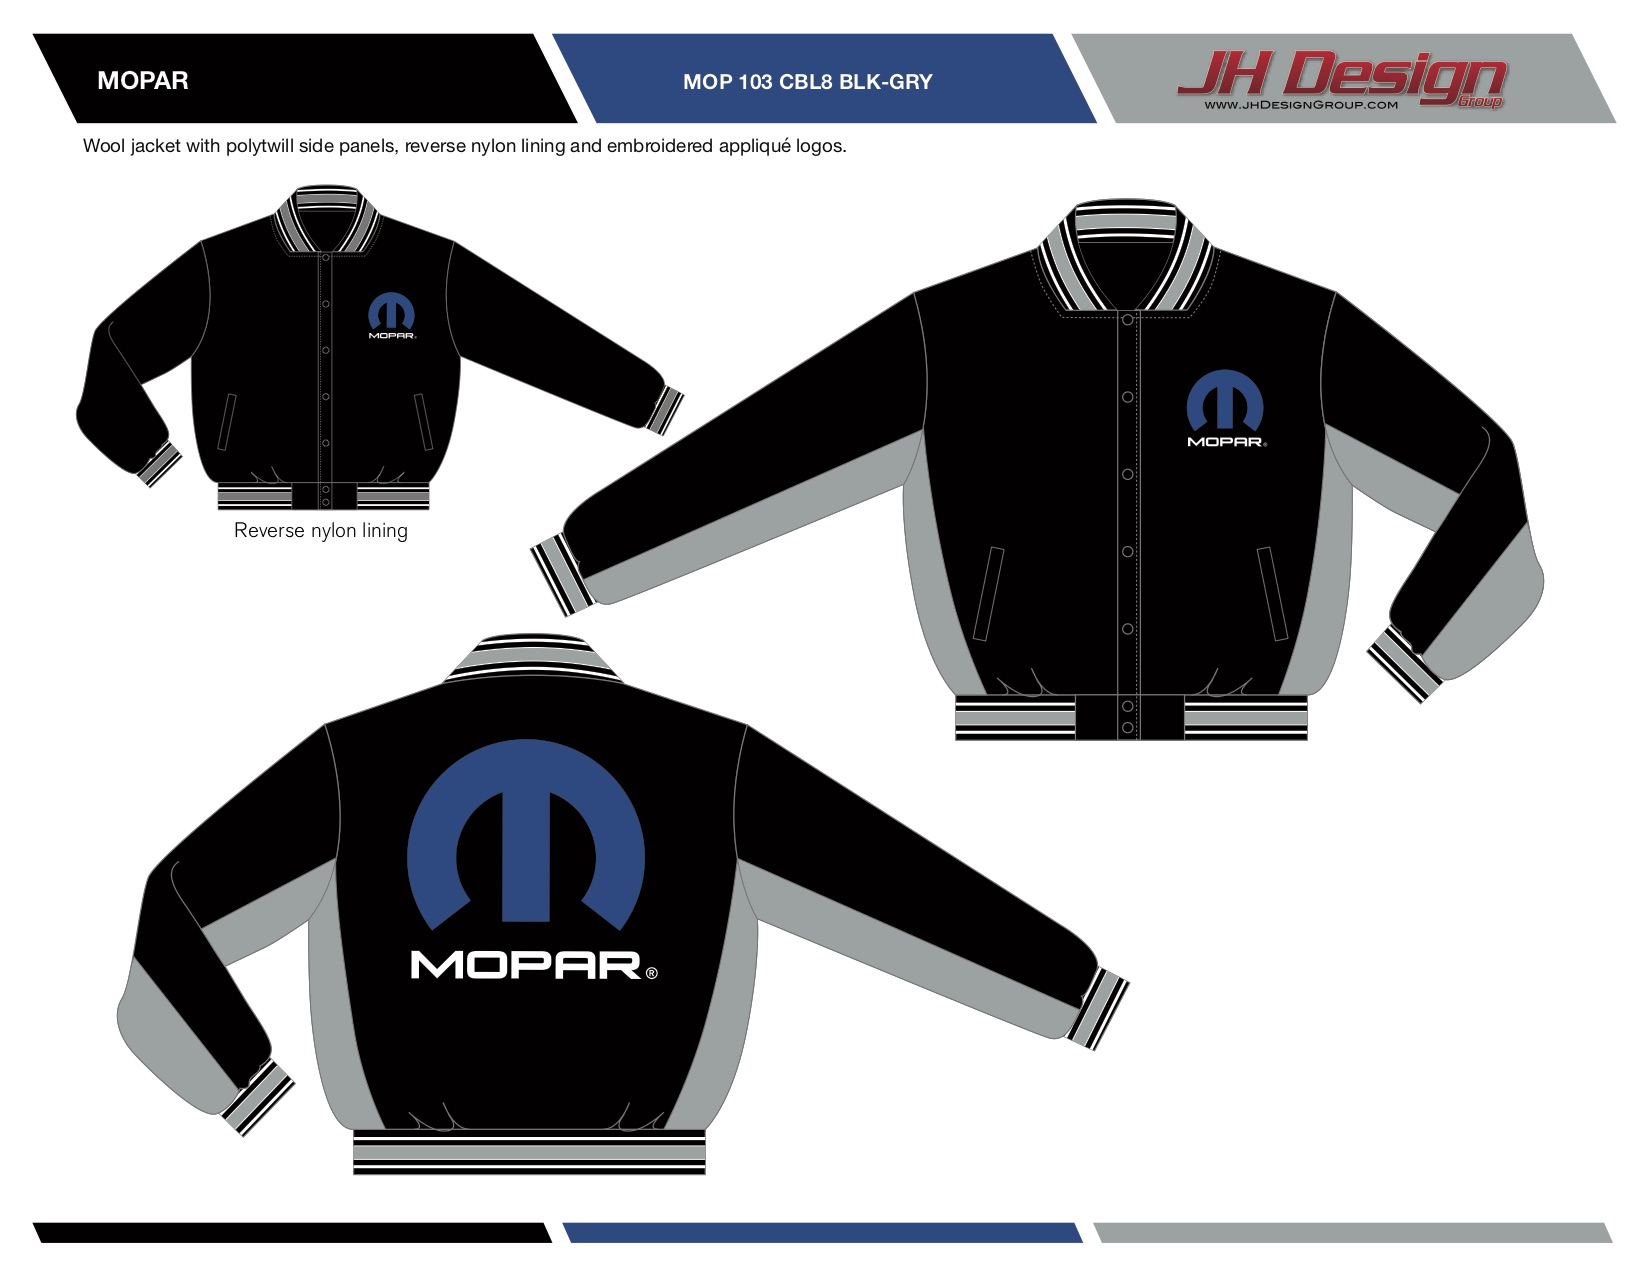 MOP 103 CBL8 BLK-GRY